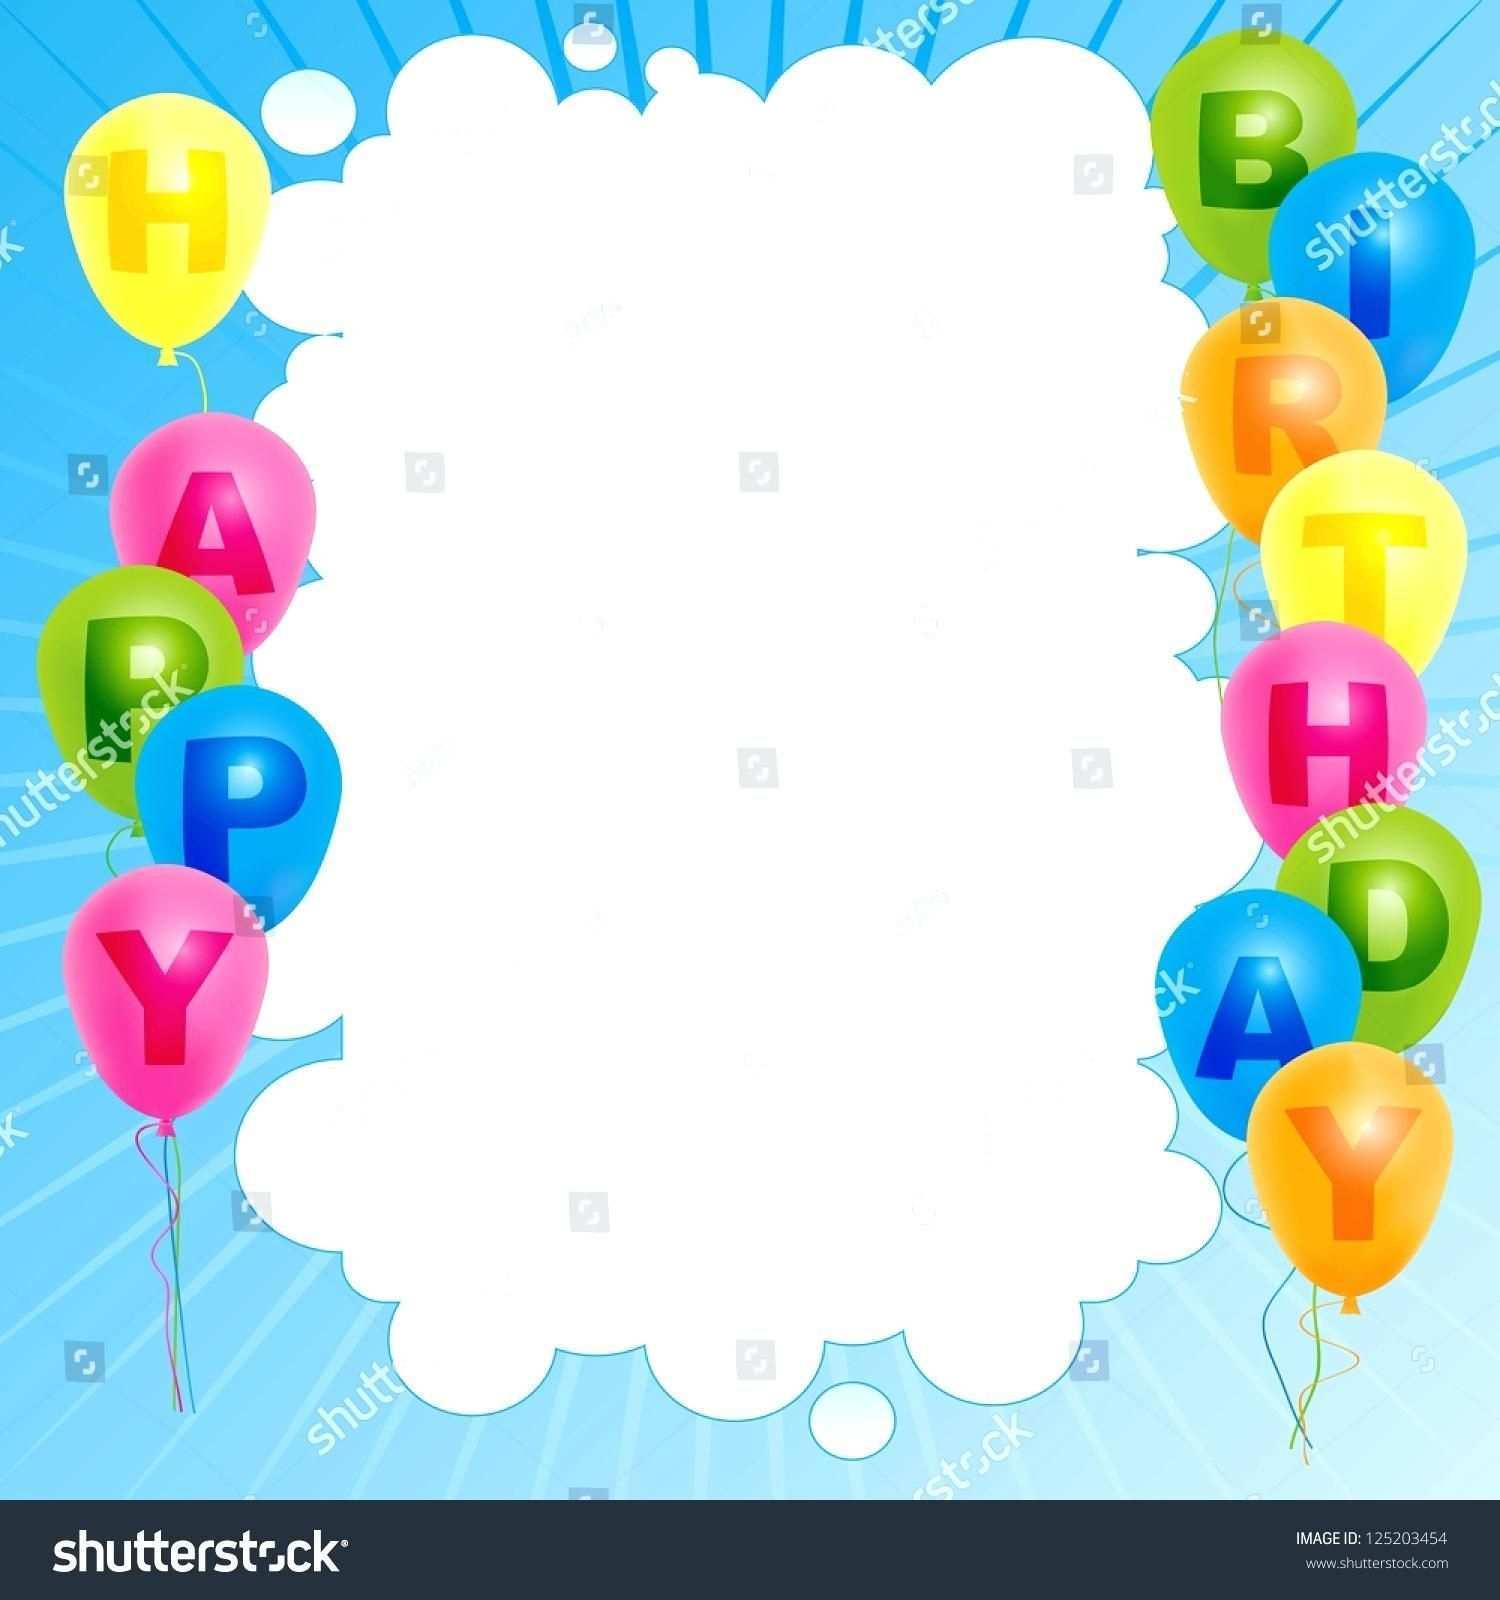 88 Adding Birthday Card Template Word Mac With Stunning Design with Birthday Card Template Word Mac